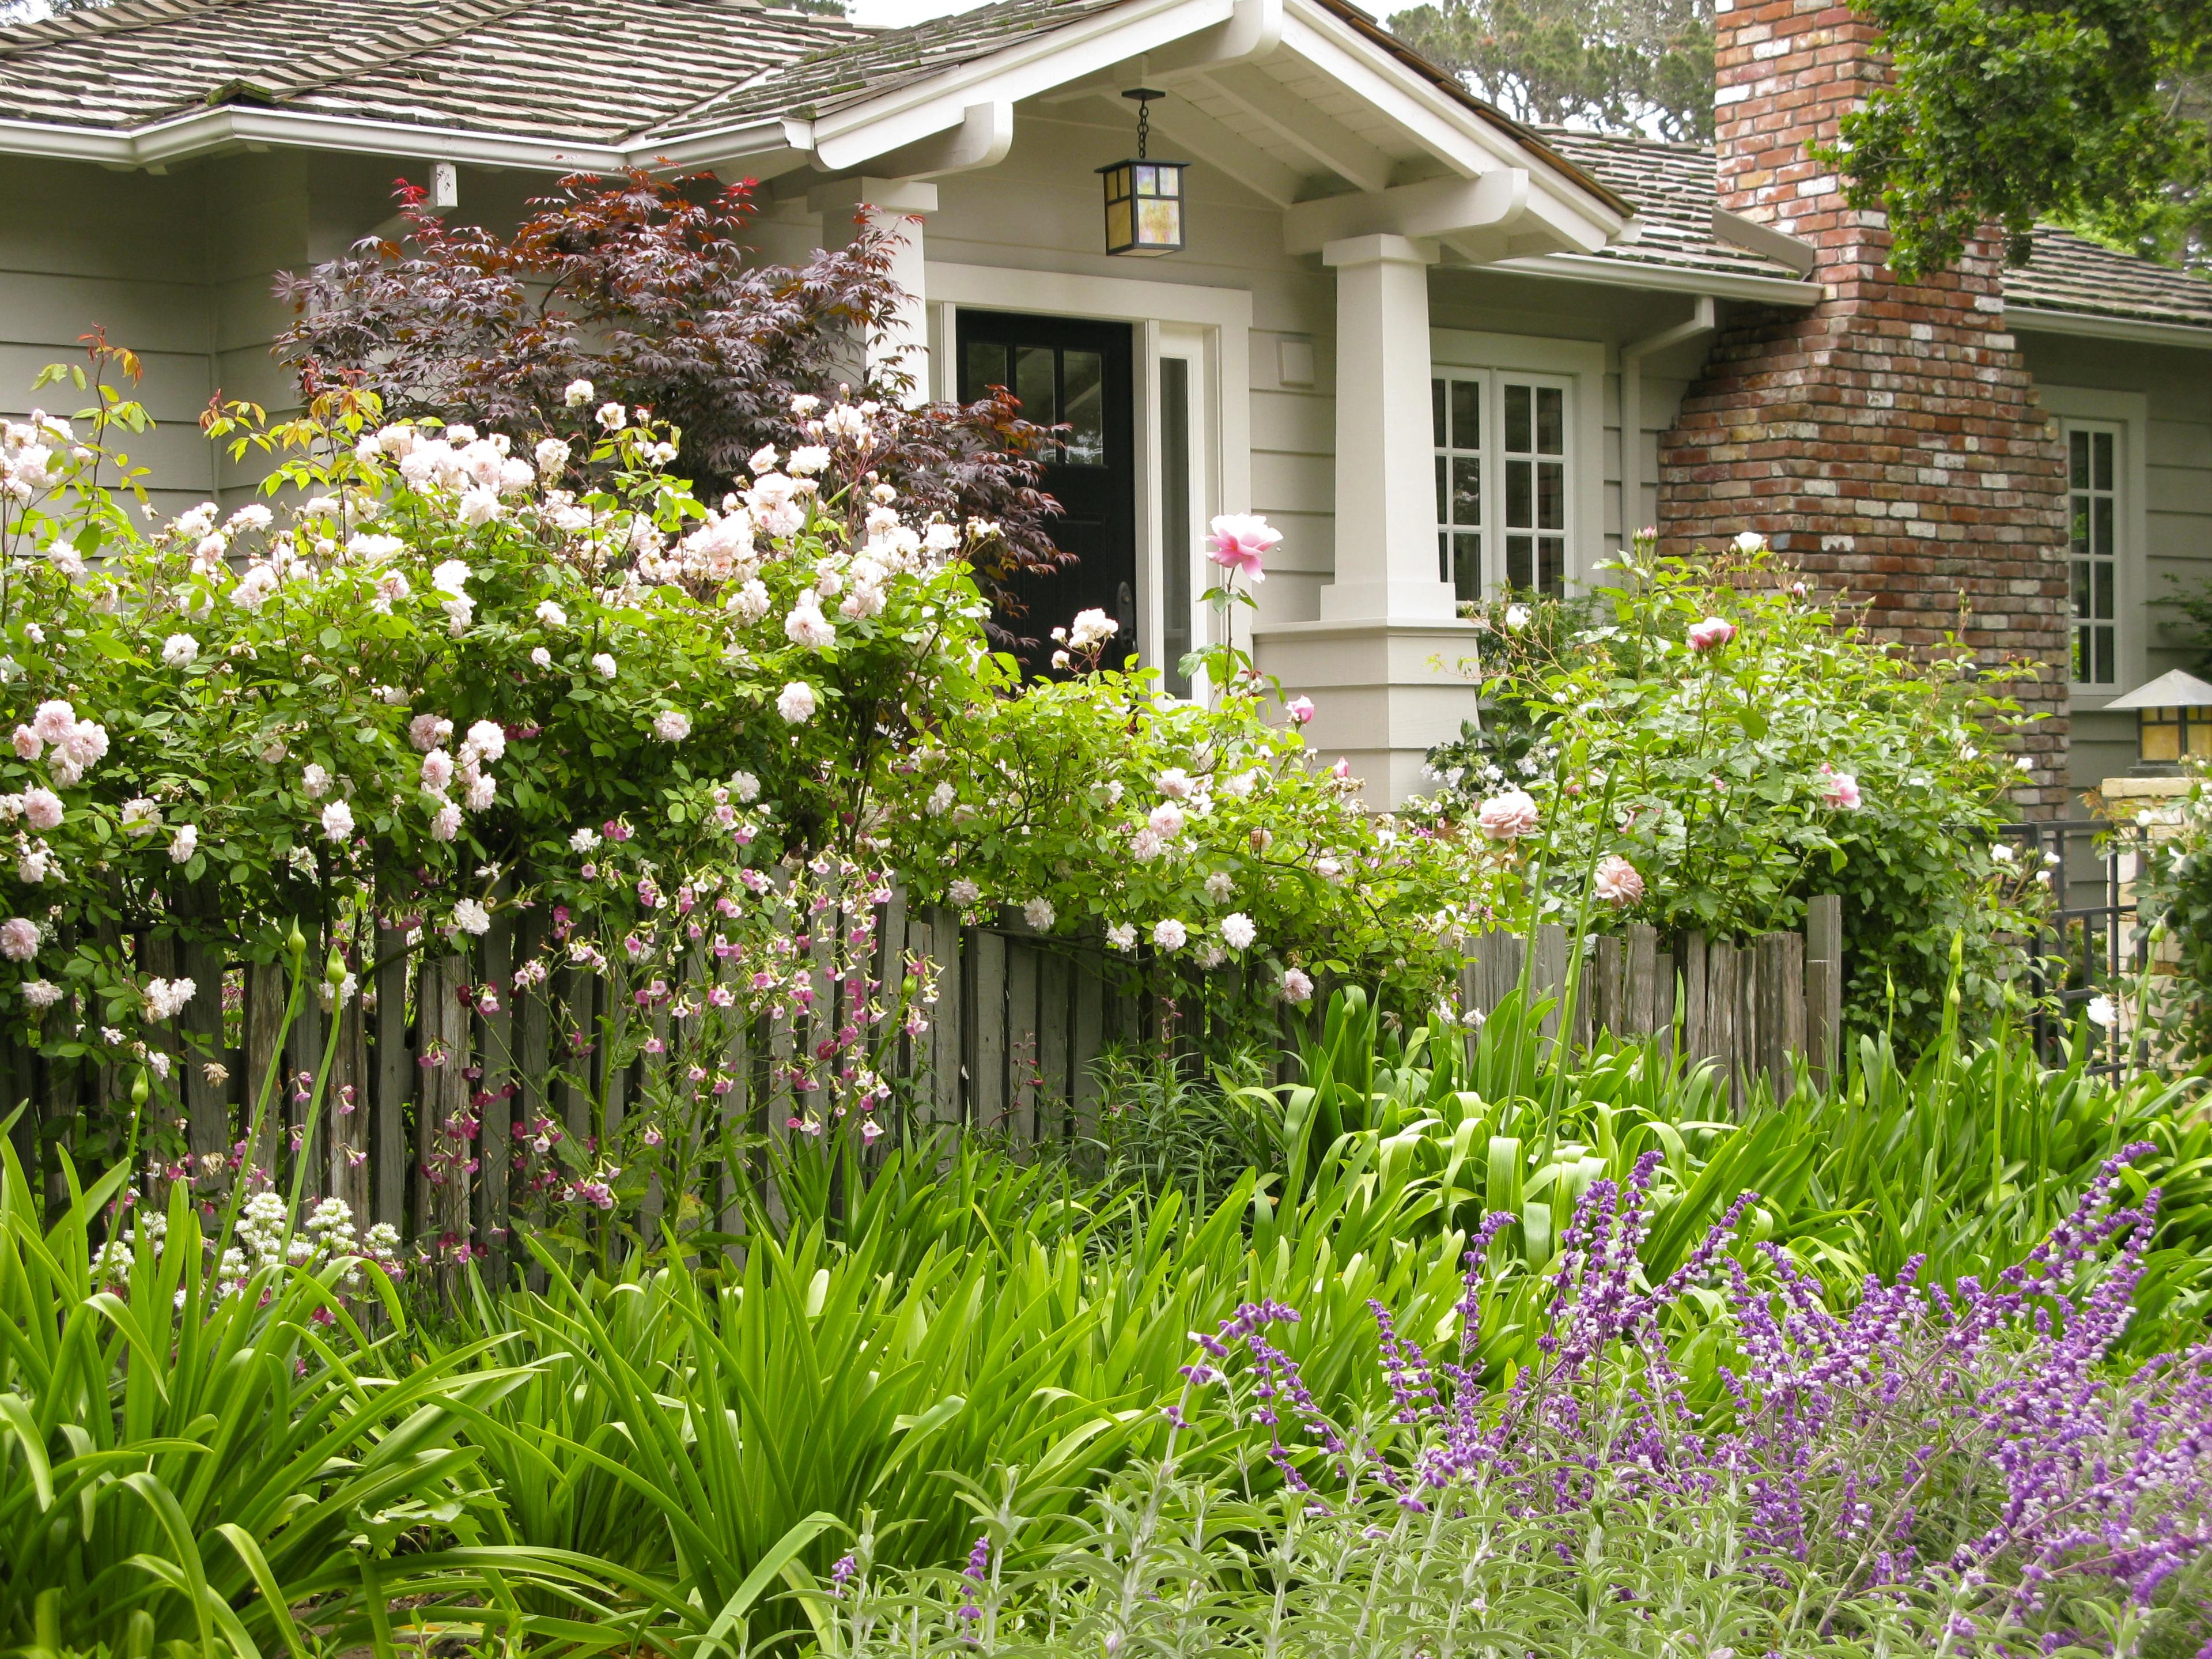 Carmels Cottage Gardens on Suburban Garden Design Ideas